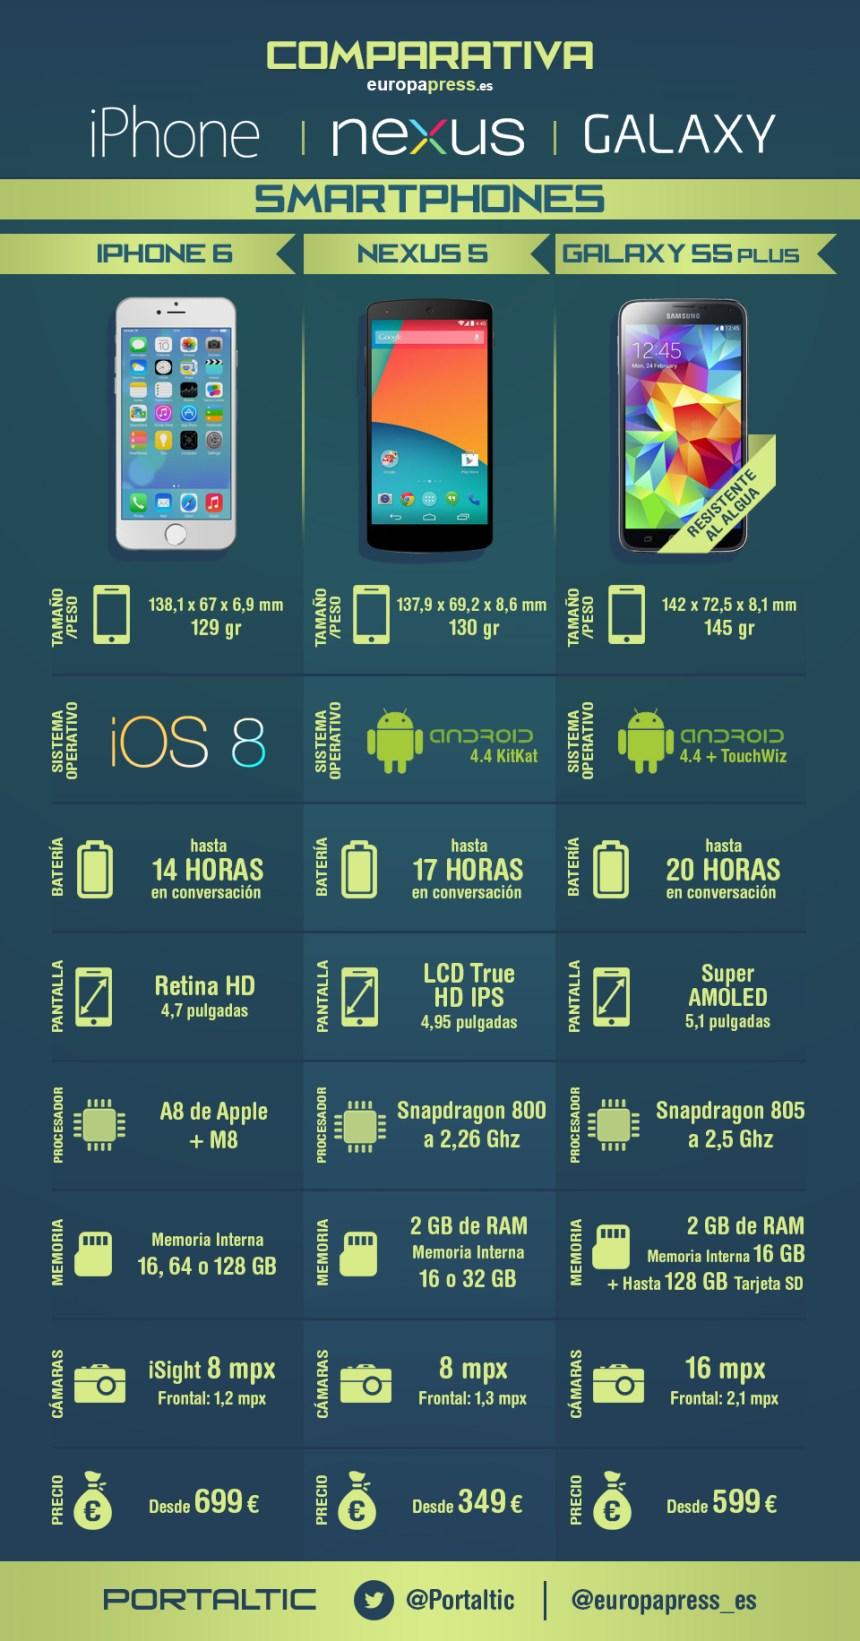 Guerra de Smartphones: iPhone vs Nexus vs Galaxy